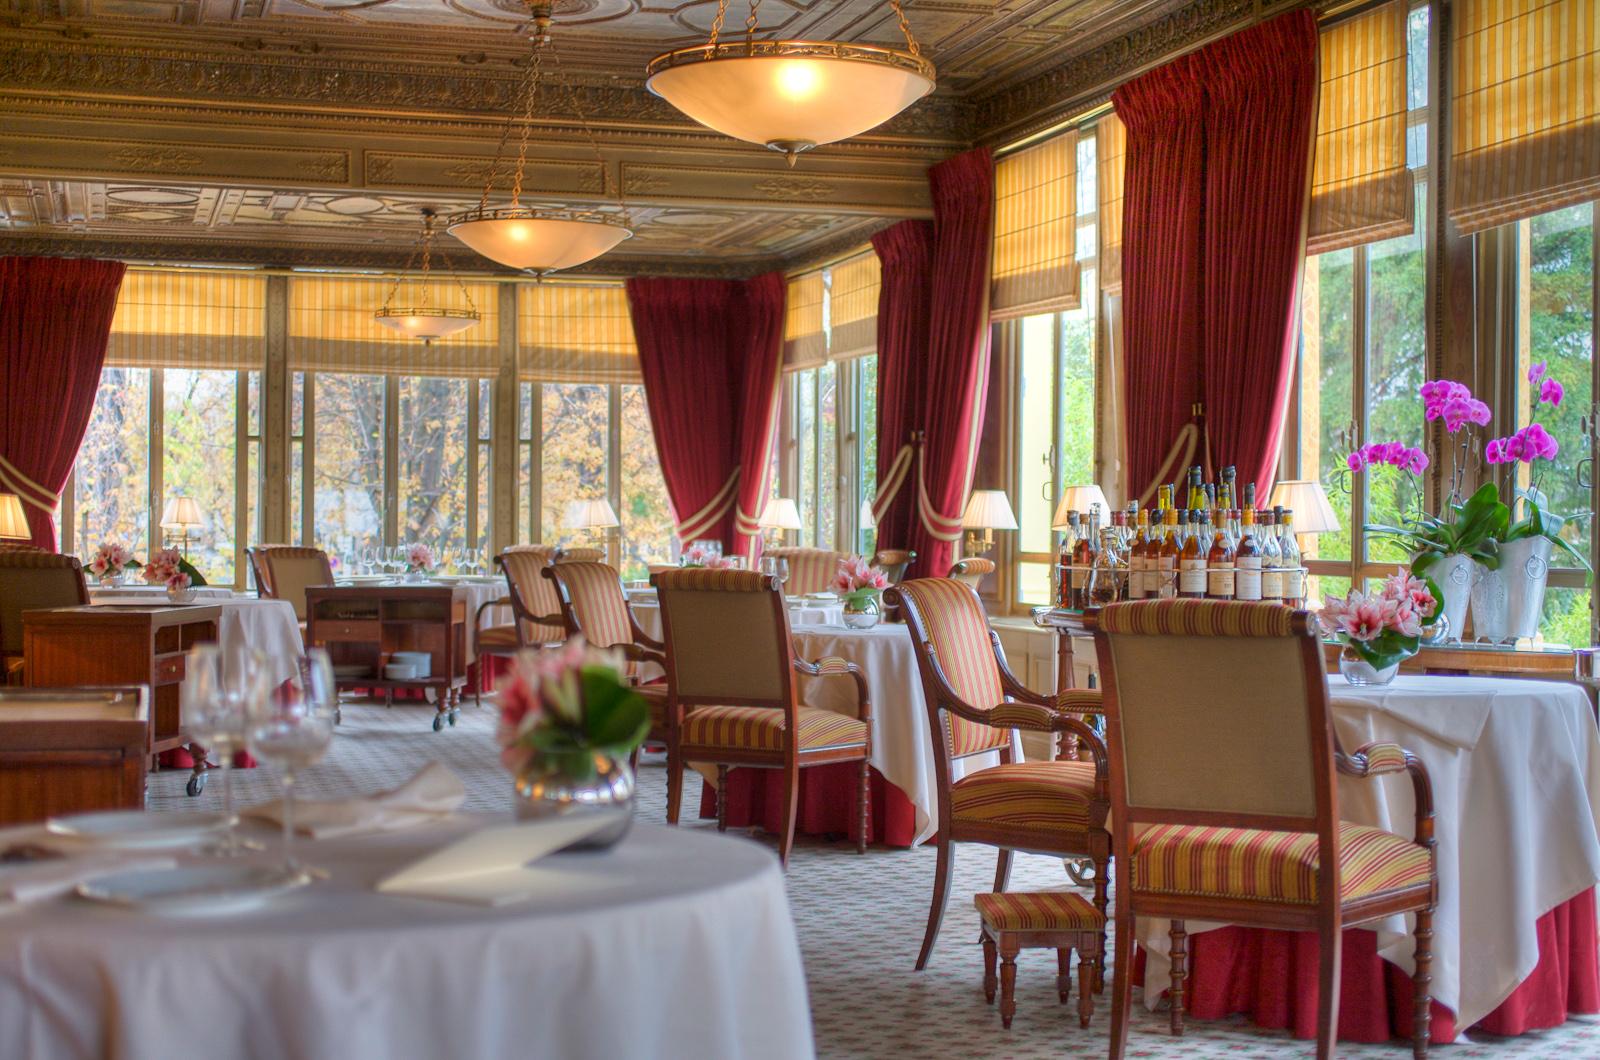 Ledoyen - Dining Room